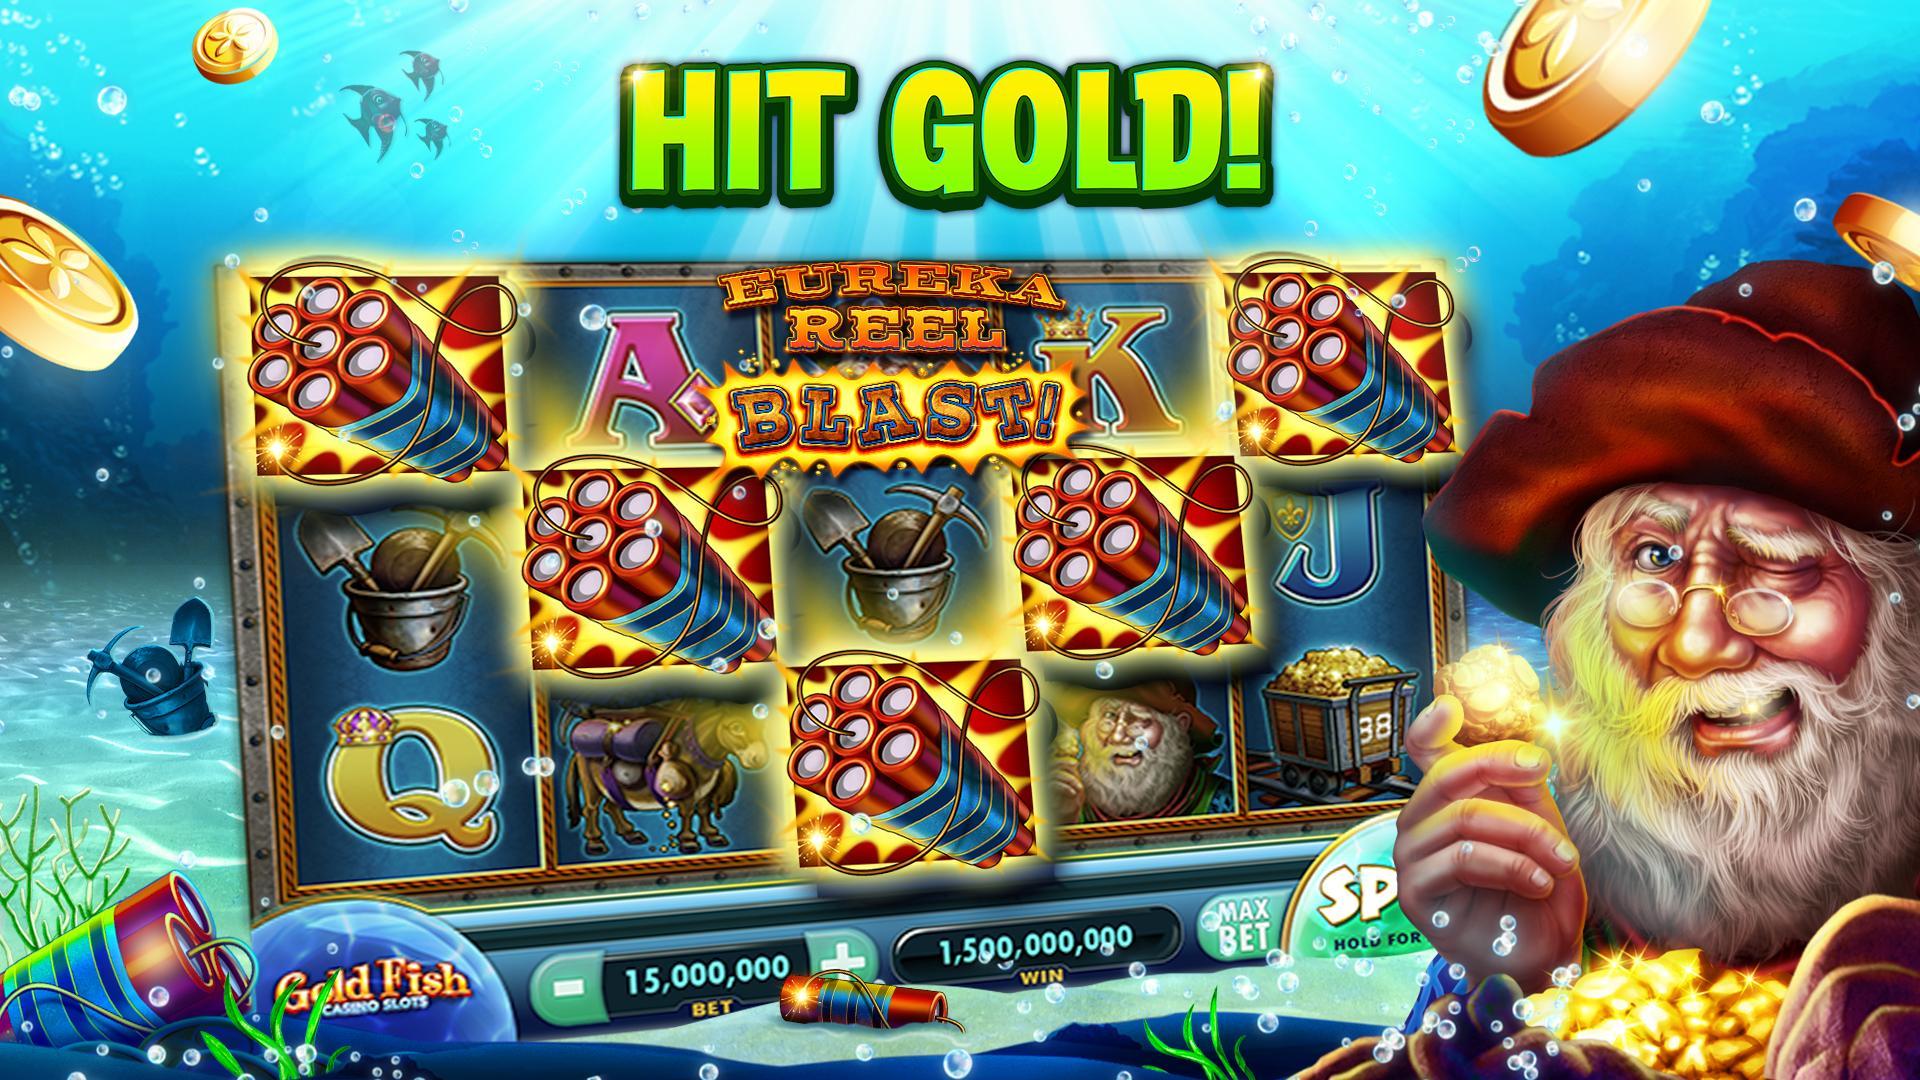 Gold Fish Casino Slots - FREE Slot Machine Games 25.09.00 Screenshot 7